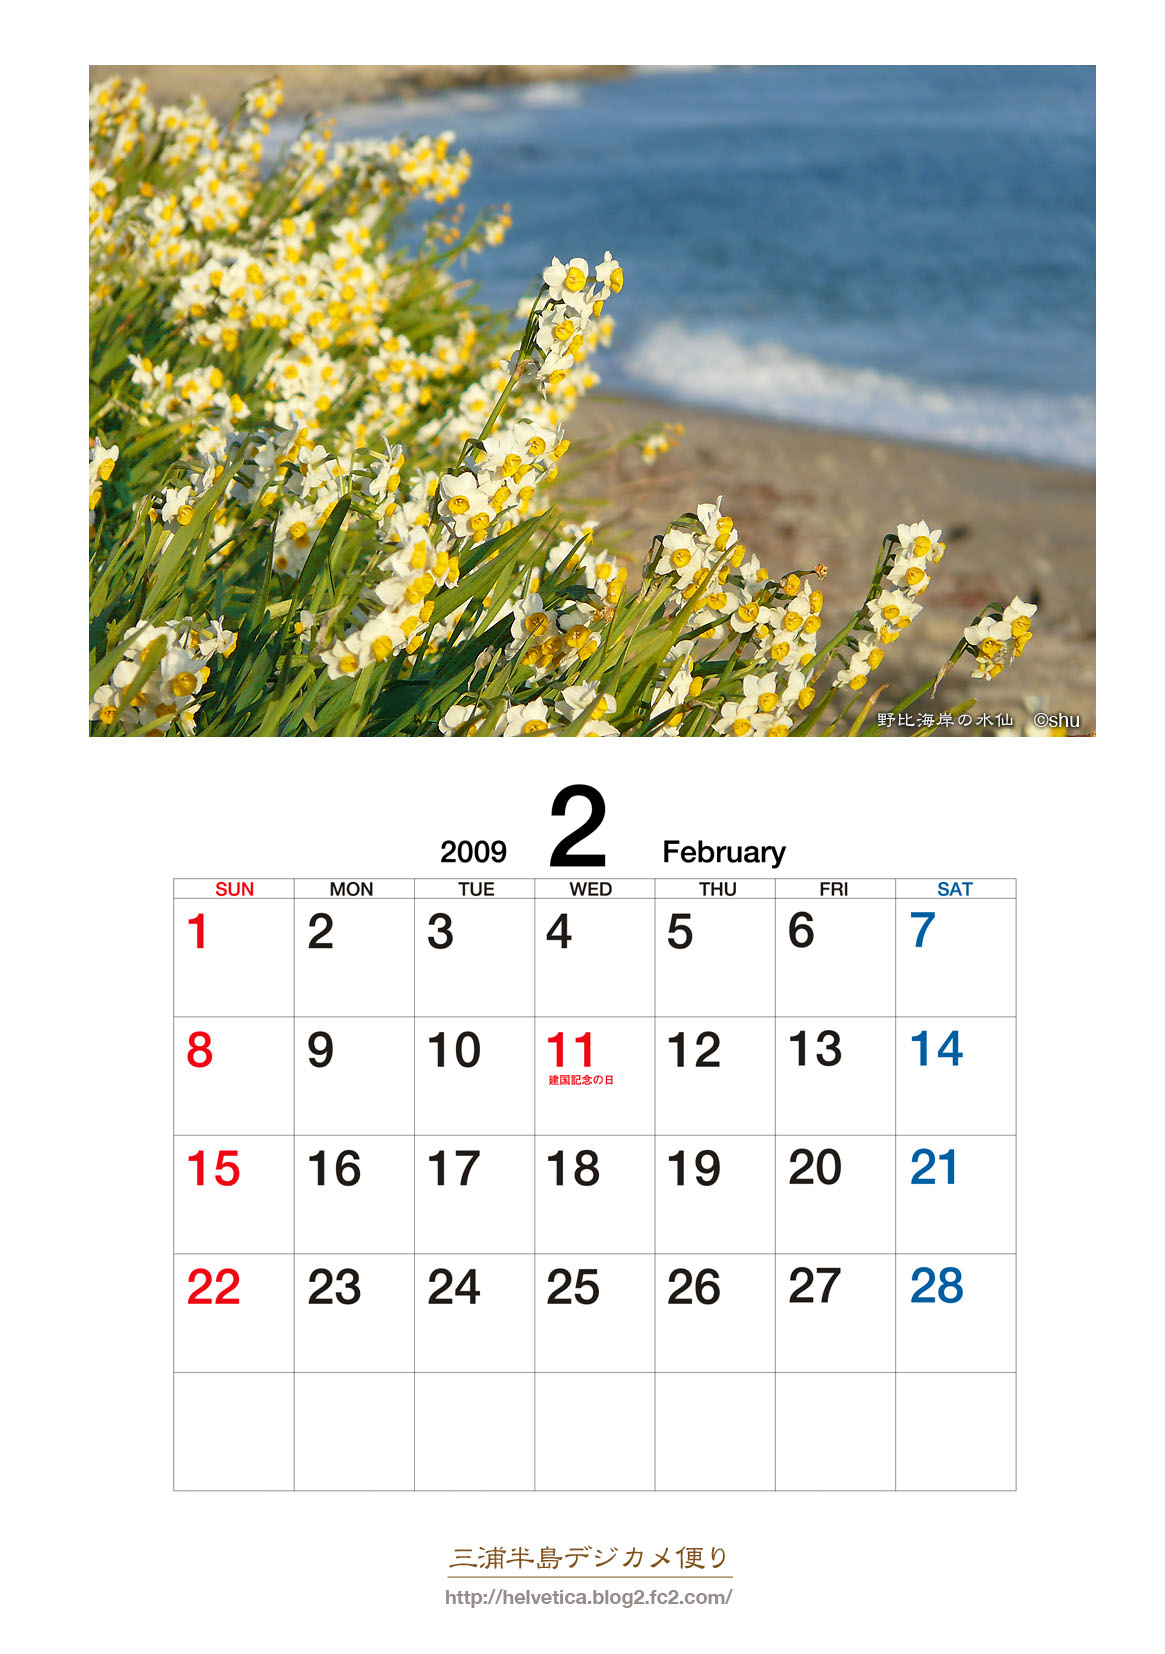 カレンダー カレンダー 2月 : ... カレンダー2月(野比海岸の